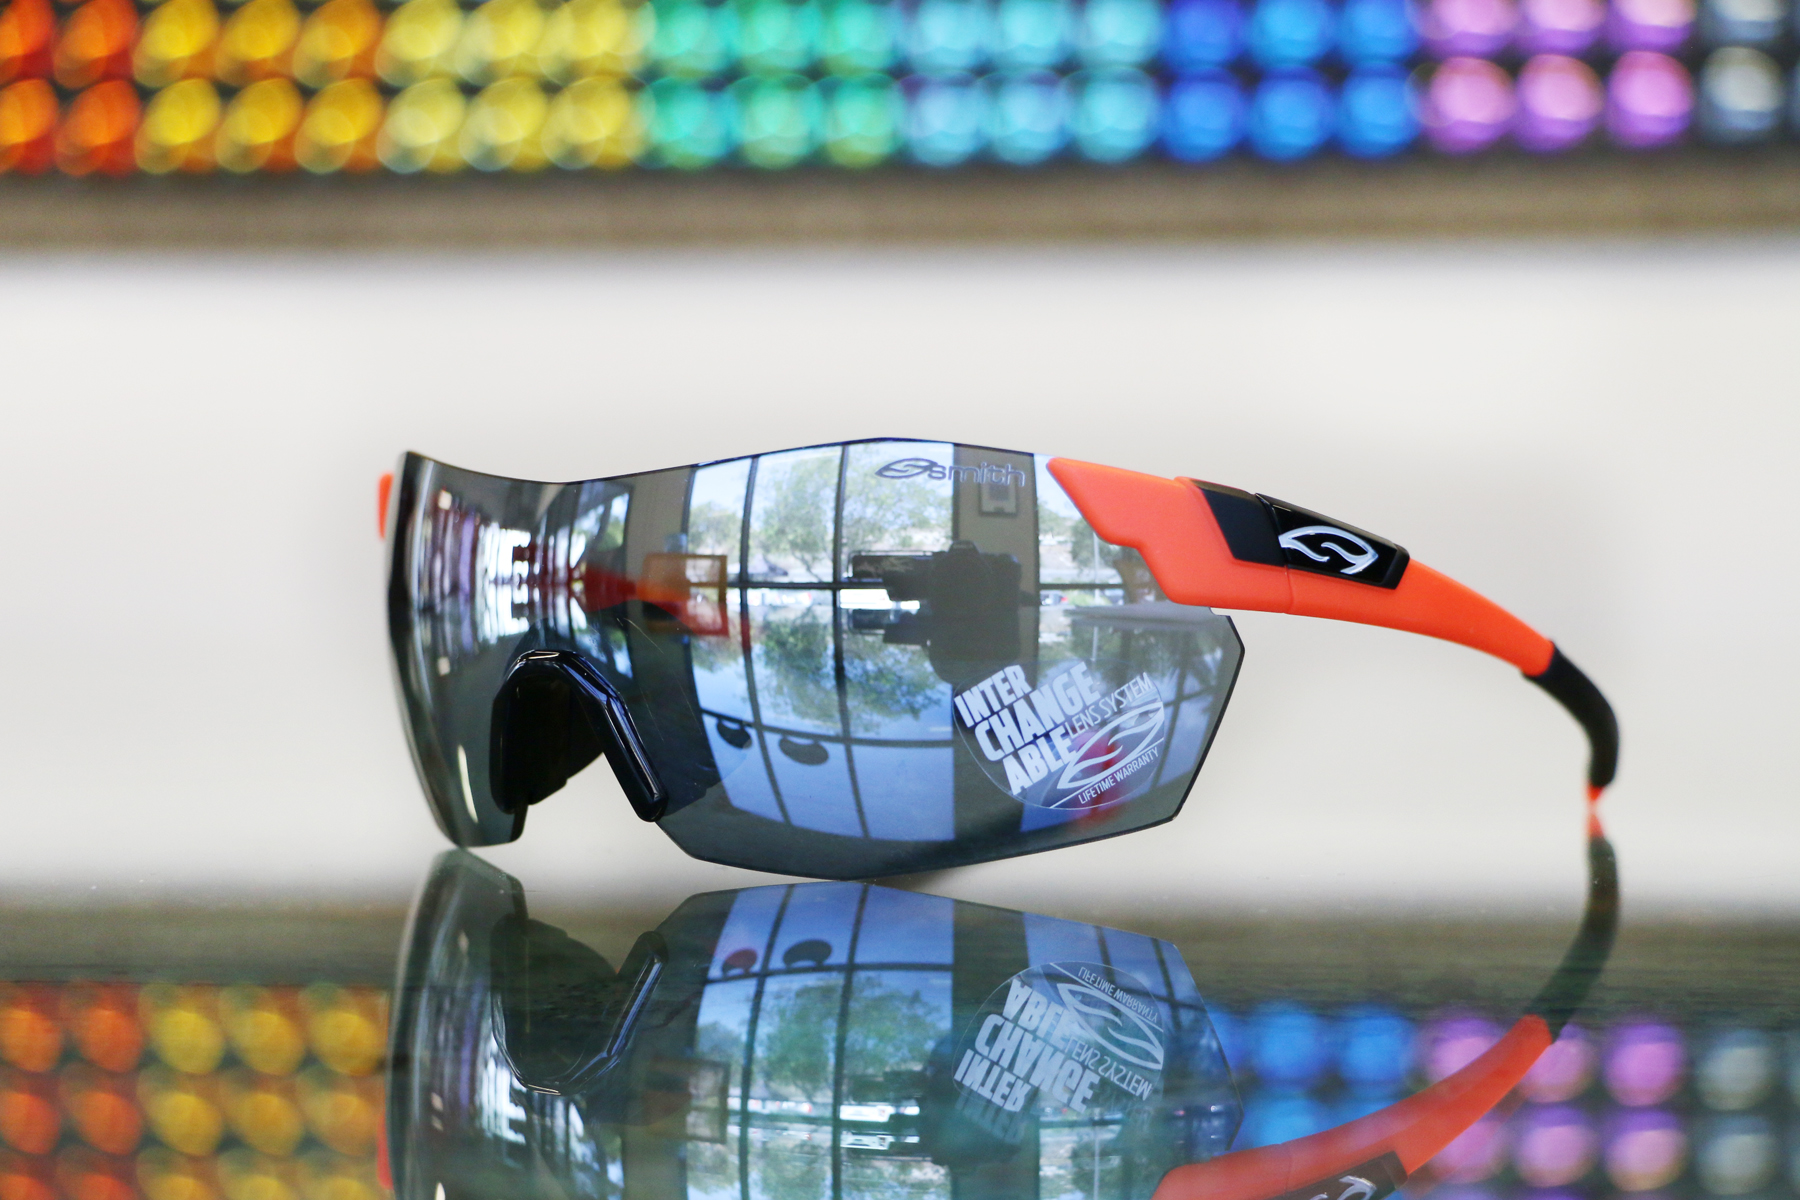 Smith Pivlock V2 Max, Tour de France Sunglasses, Prescription Cycling Sunglasses